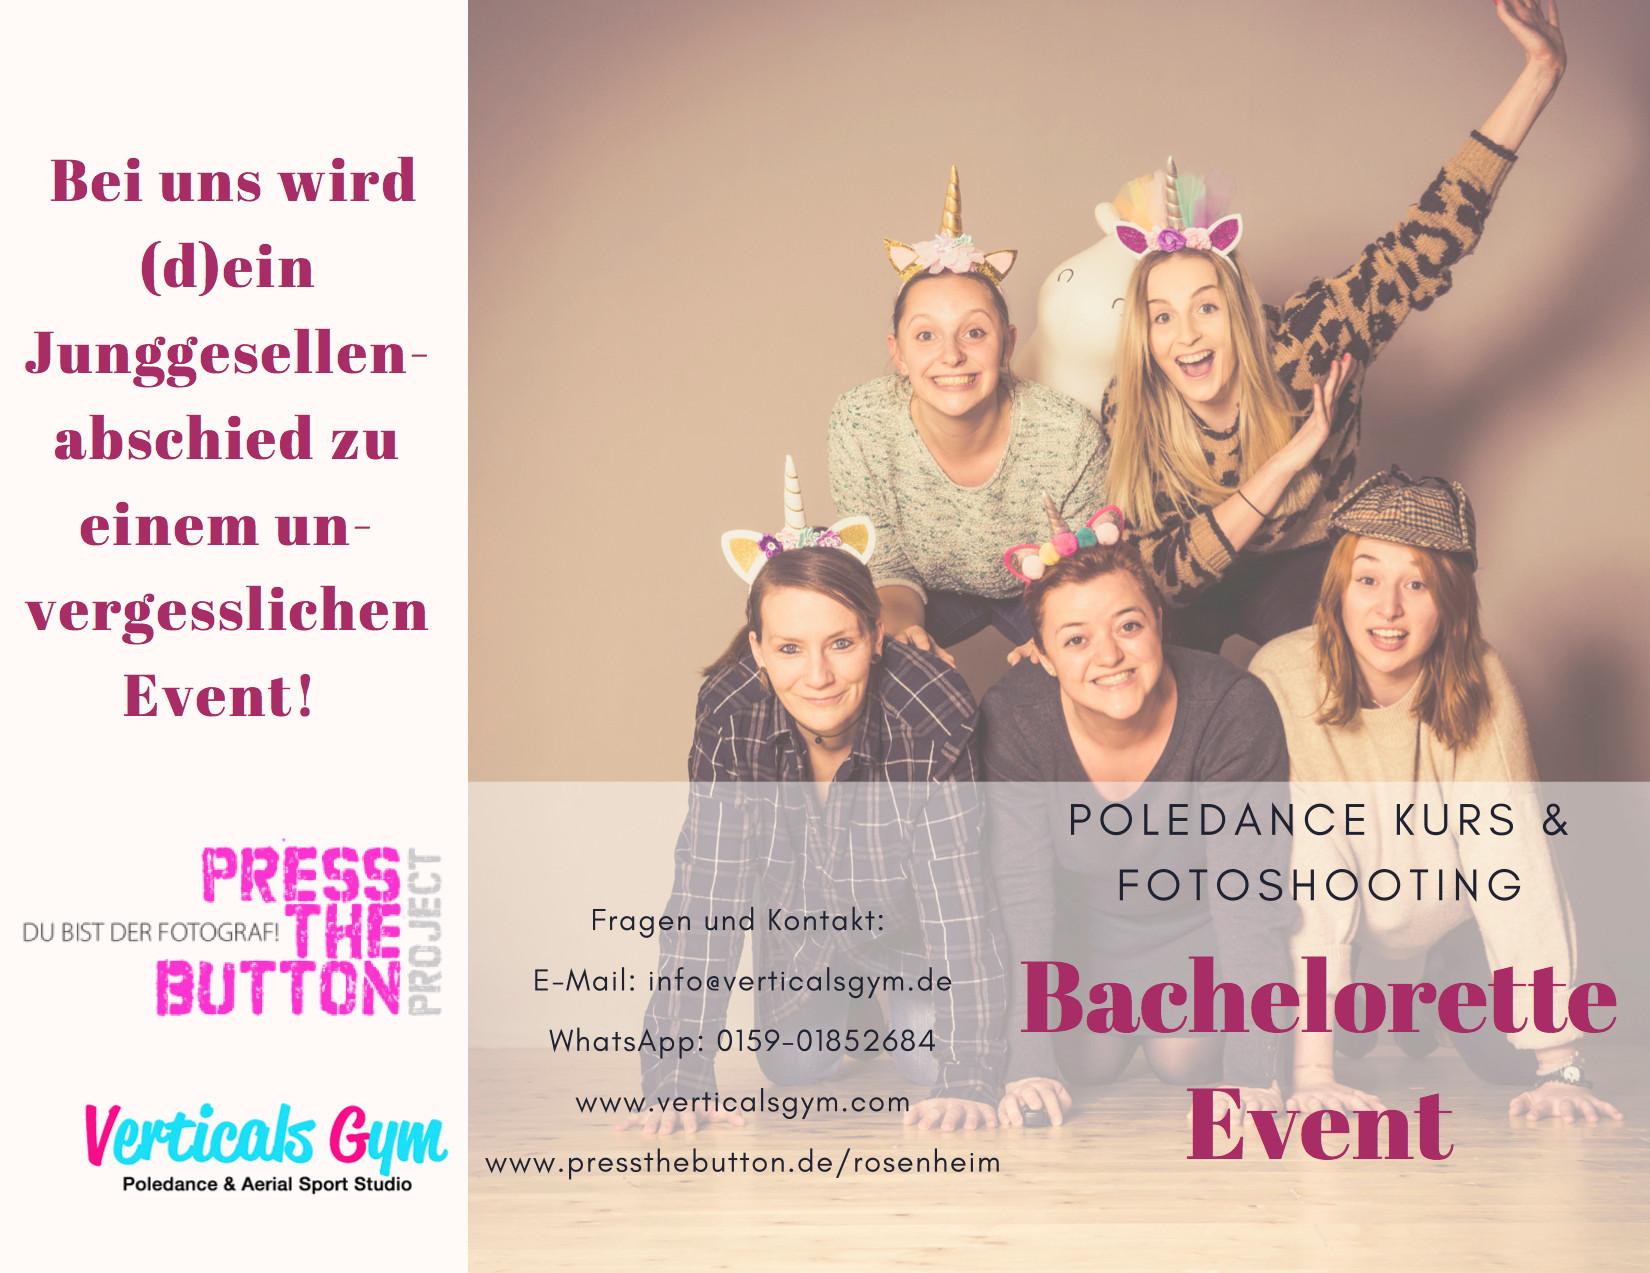 Bachelorette Events